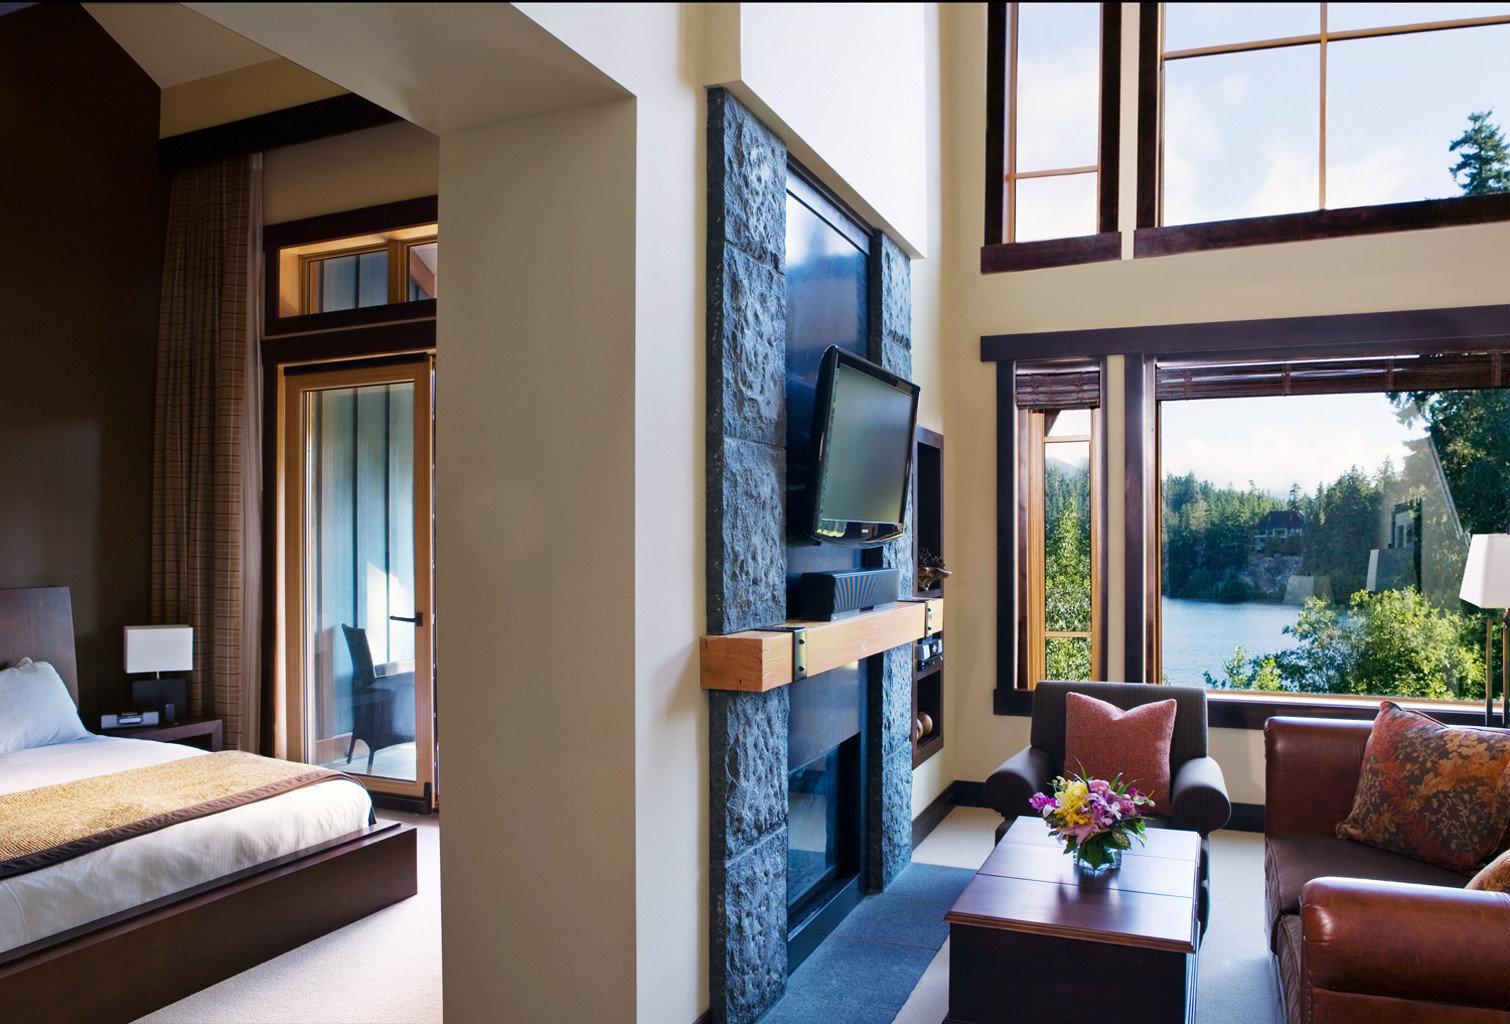 Bedroom Fireplace Lodge Luxury Mountains Romantic Scenic views Suite sofa property living room condominium home Villa cottage